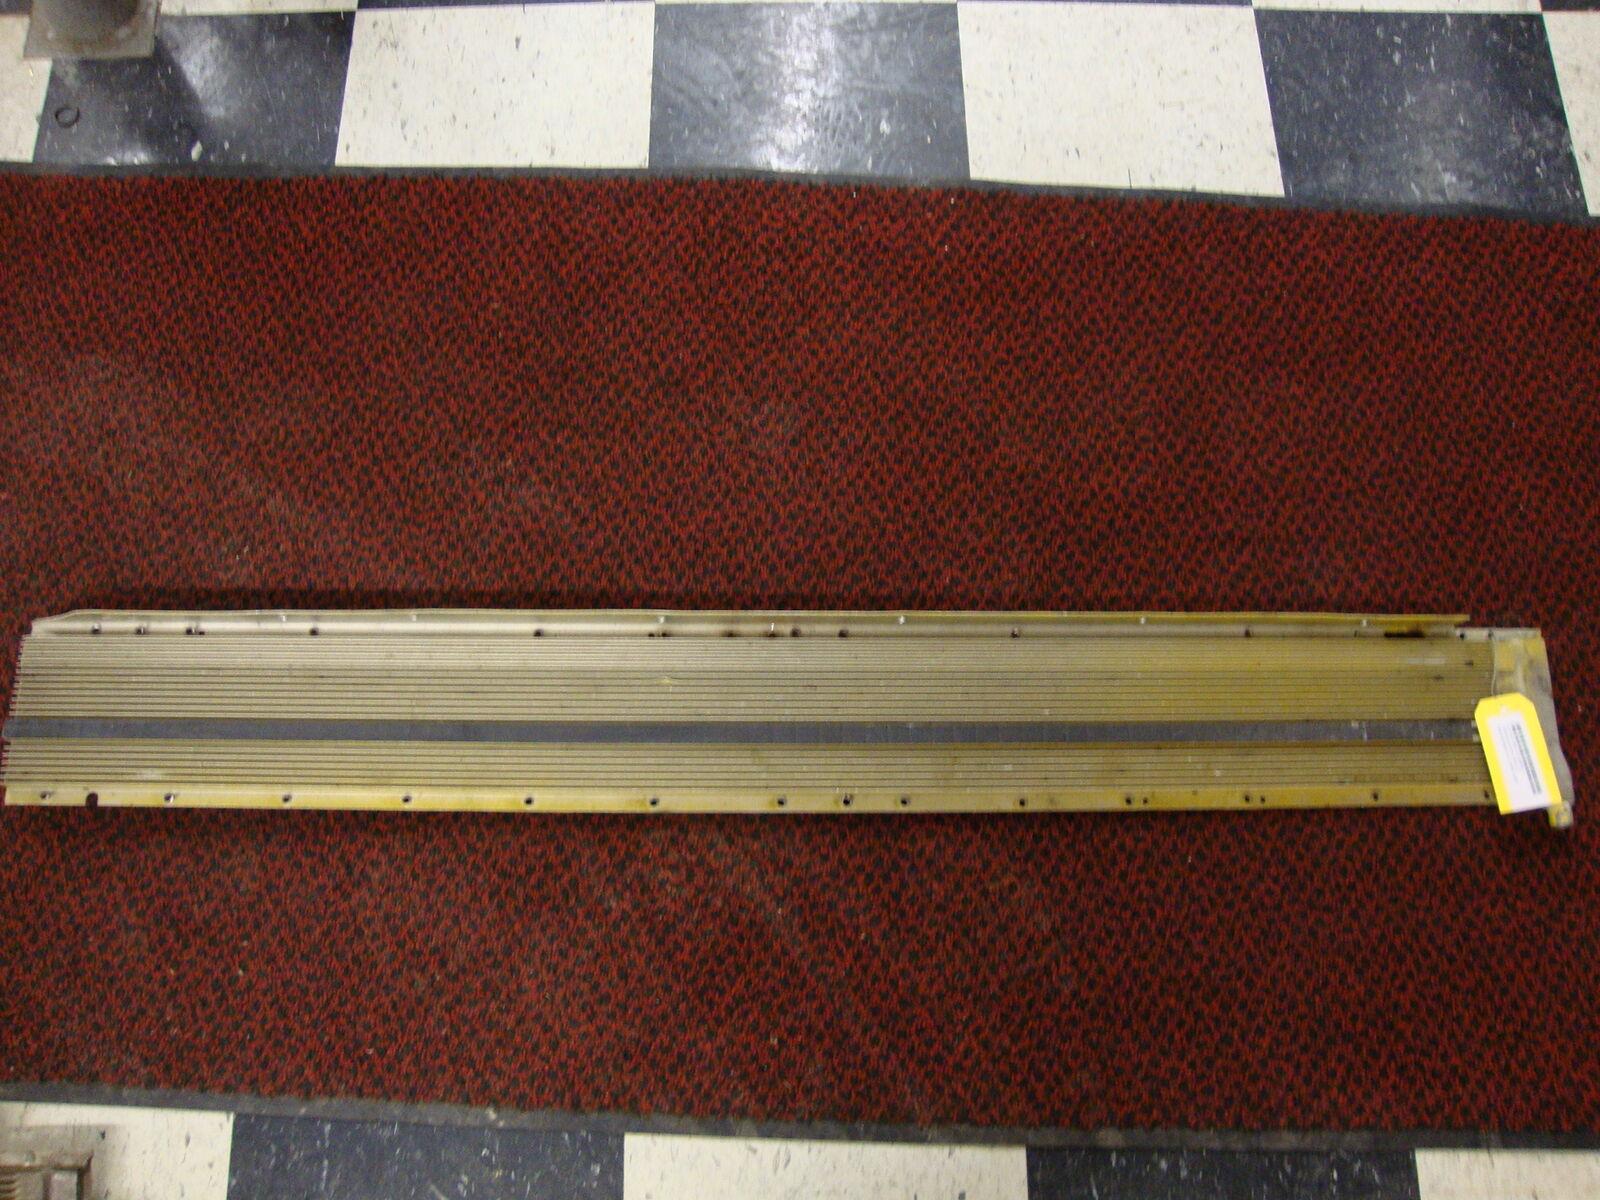 1996 Ski-Doo MXZ 583 LEFT SIDE HEAT EXCHANGER RADIATOR 517280501